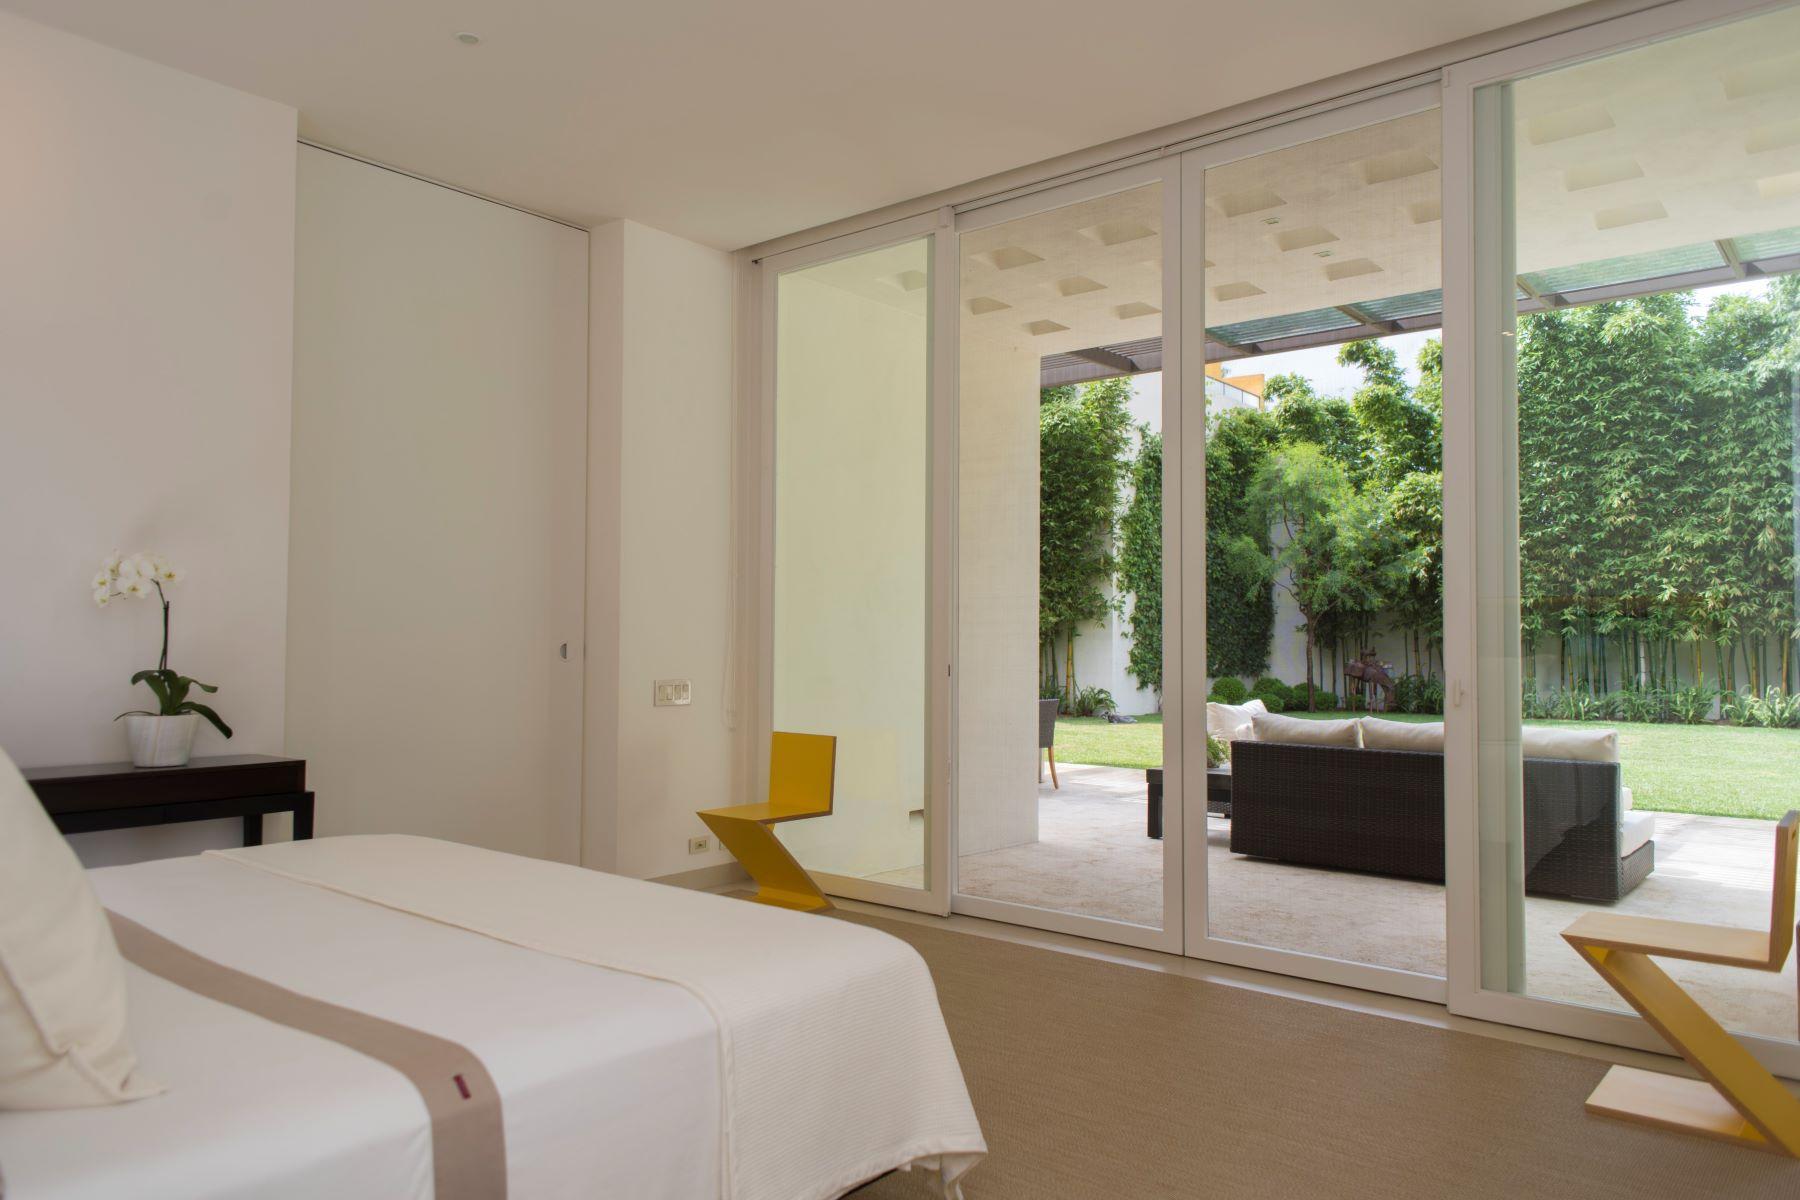 Additional photo for property listing at Villa Parkside Aldama San Miguel De Allende, Guanajuato 37700 México